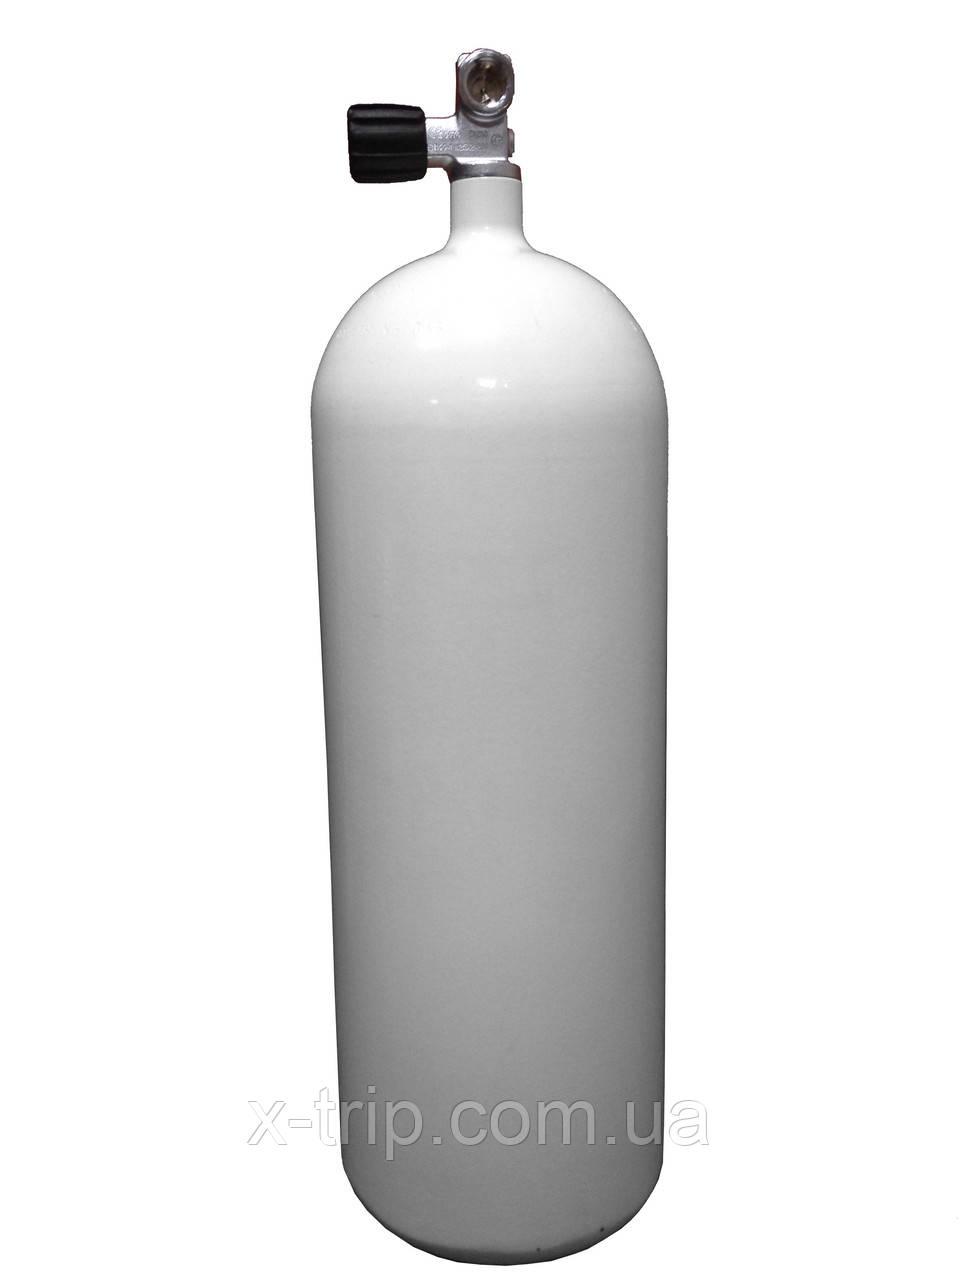 Баллон для дайвинга 12 л, 230 Bar, 171 мм с вентилем Concave